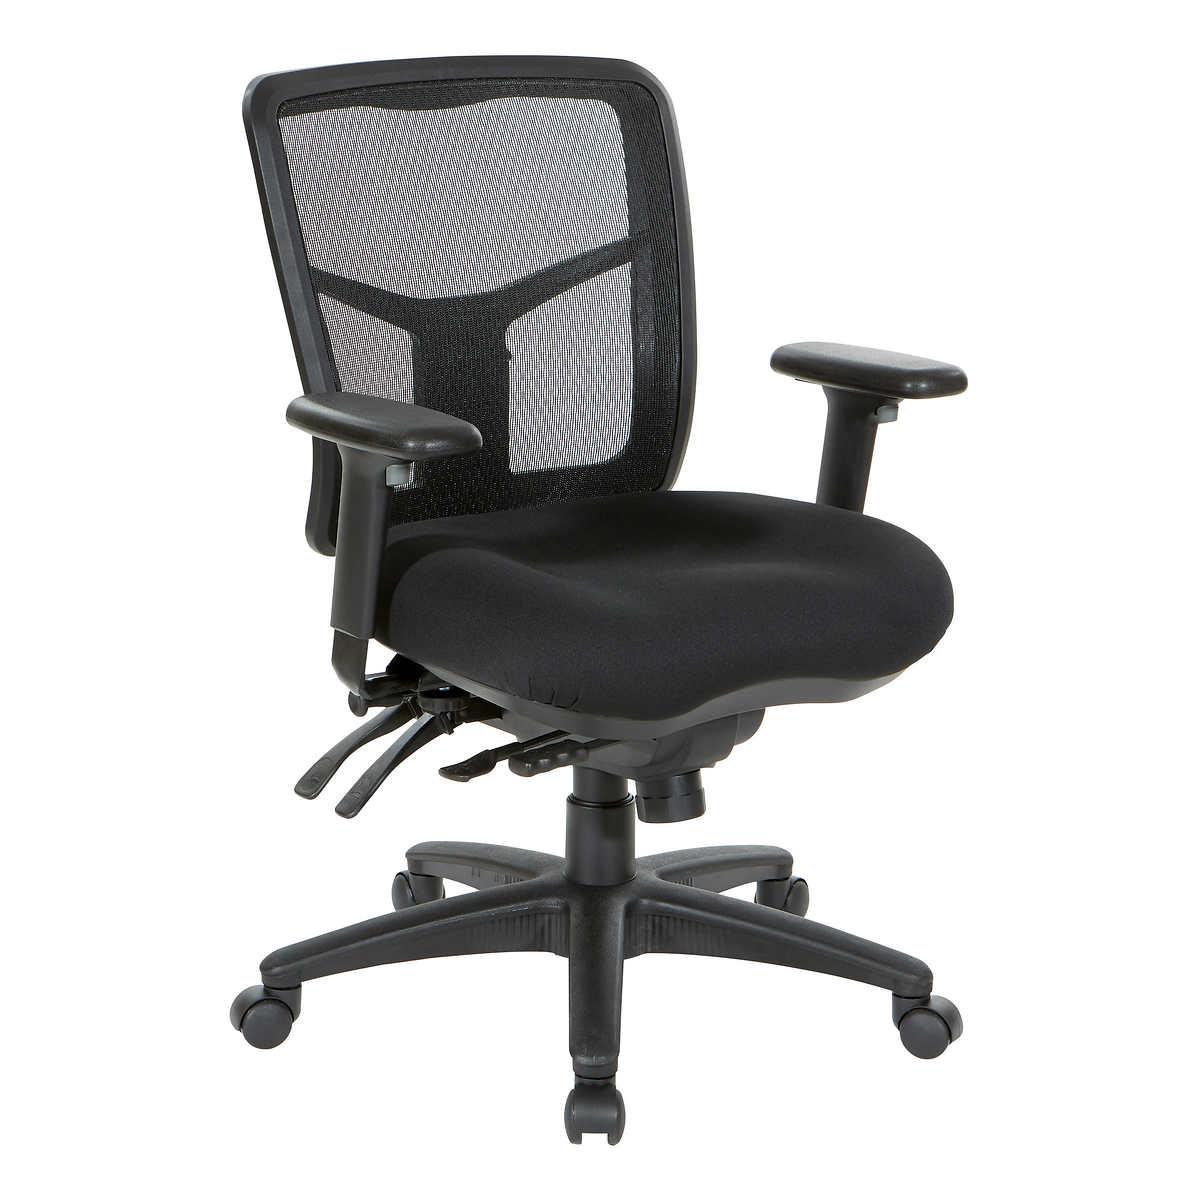 75735fdb410 Pro-Line II Deluxe Adjustable Air Grid Back Ergonomic Office Chair